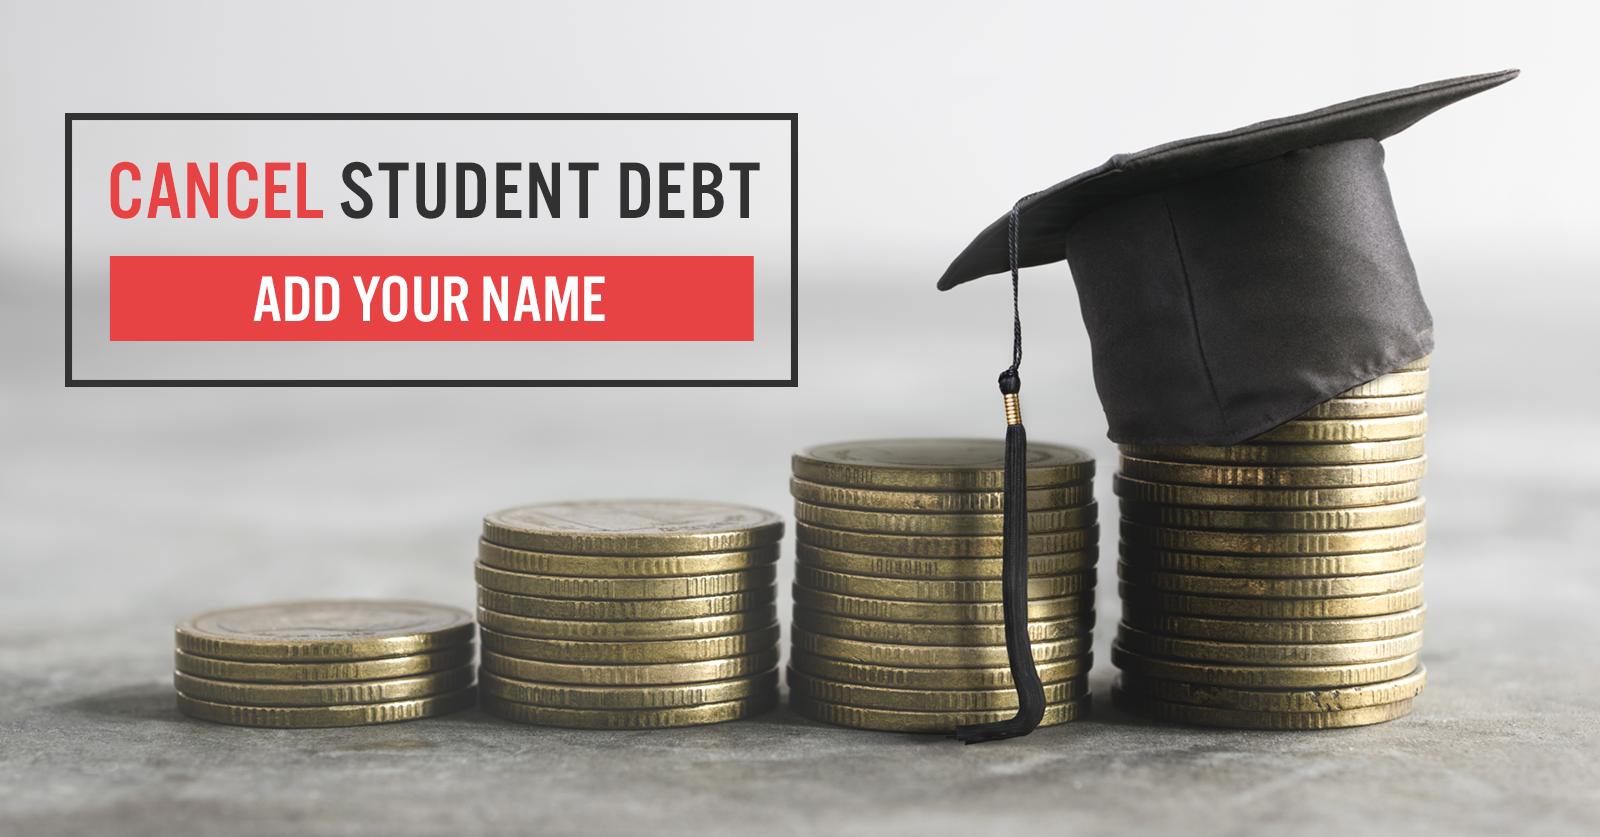 Cancel student debt